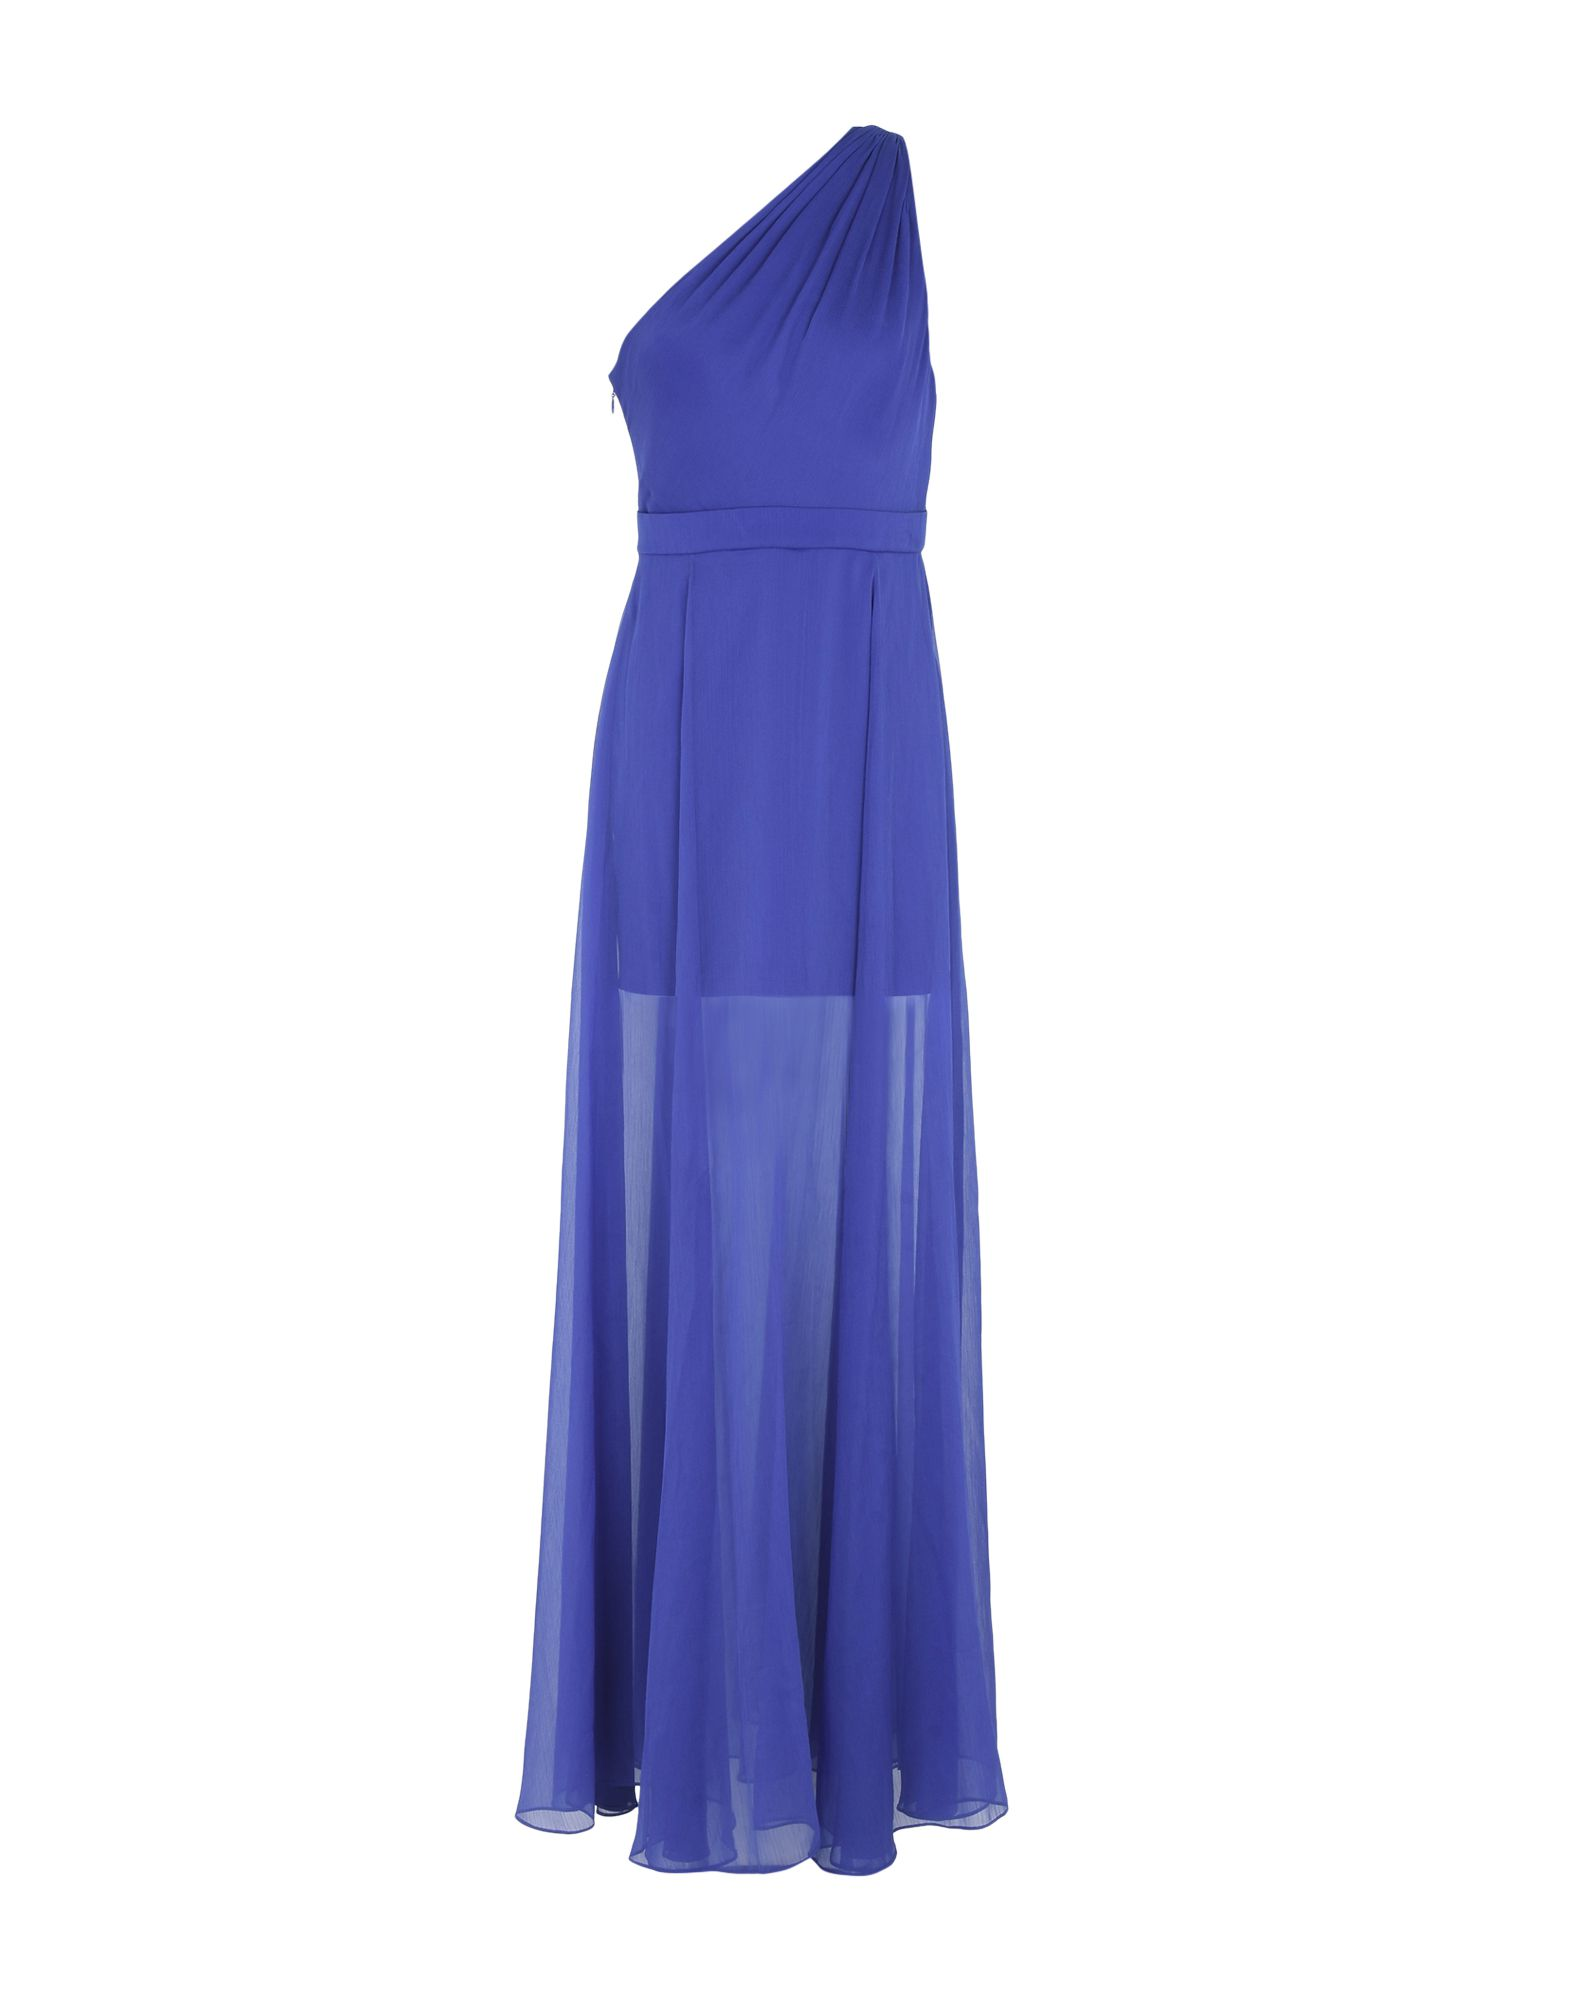 HALSTON HERITAGE Длинное платье lacoste брюки lacoste hf020103m синий